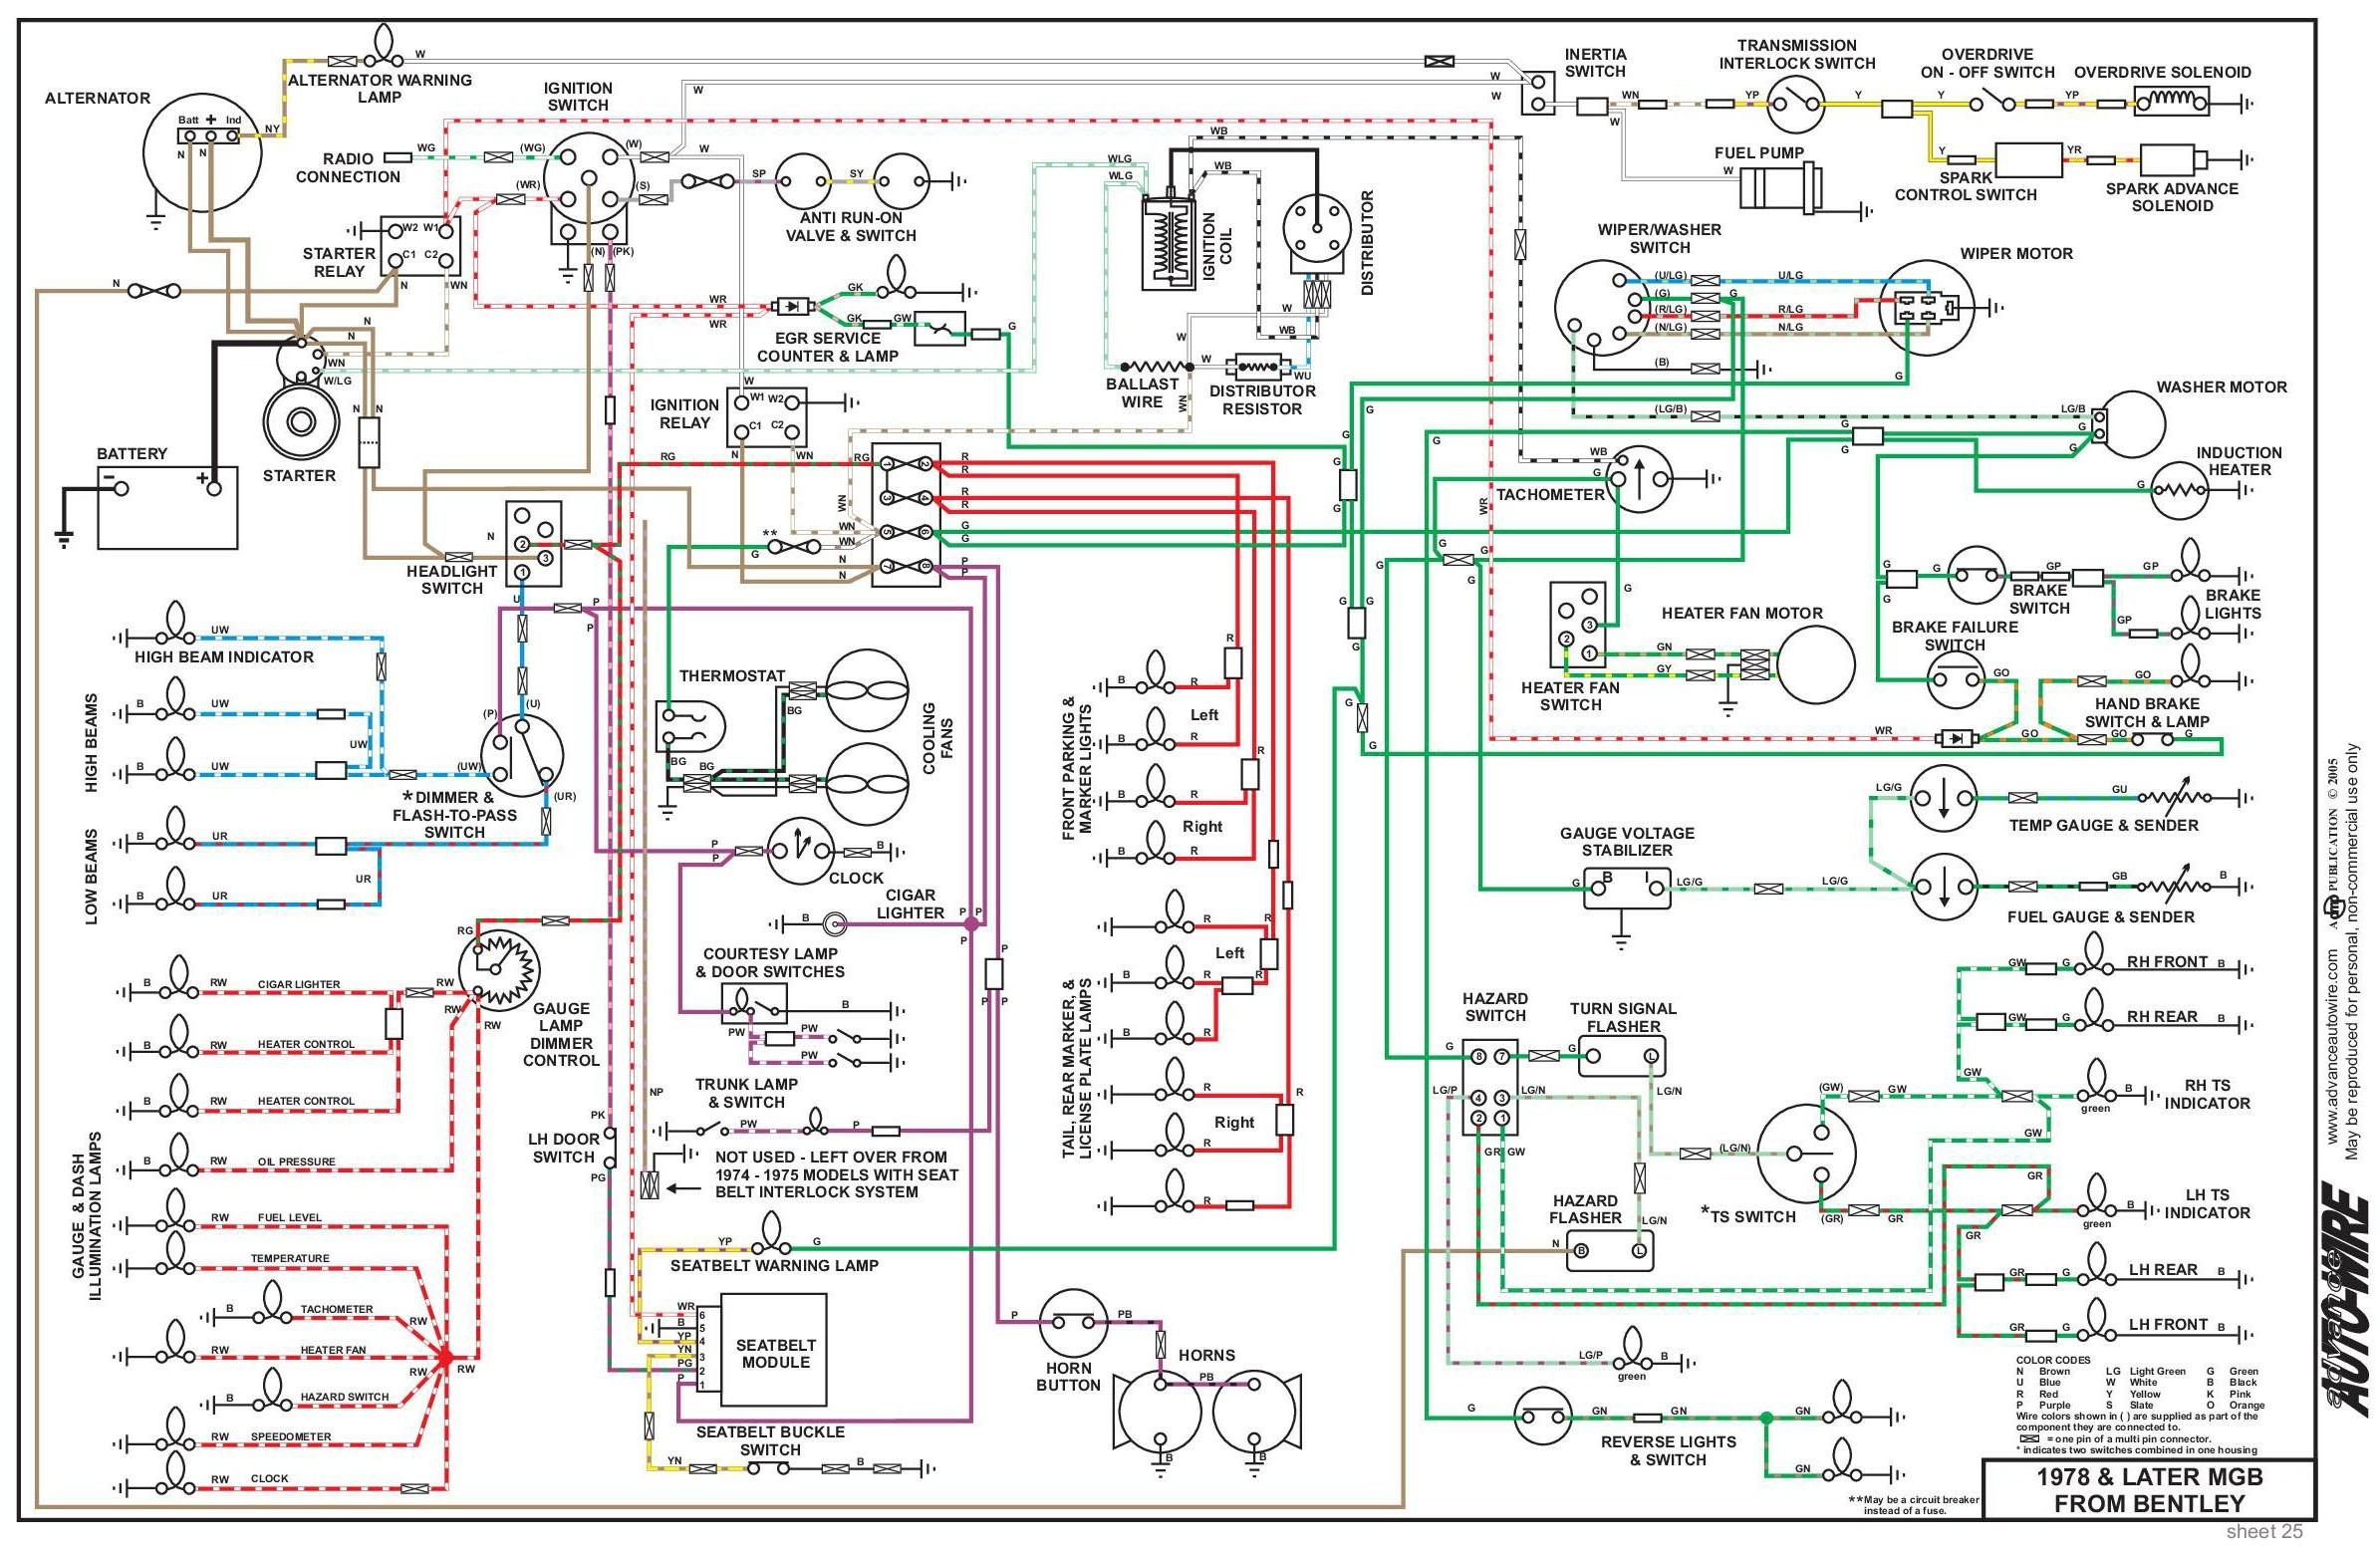 Kohler Voltage Regulator Wiring Diagram Elegant Image Command 1976 Mgb Od Wire Center U2022 Rh 144 202 77 Chevy 2 8l Engine Trusted Diagrams From